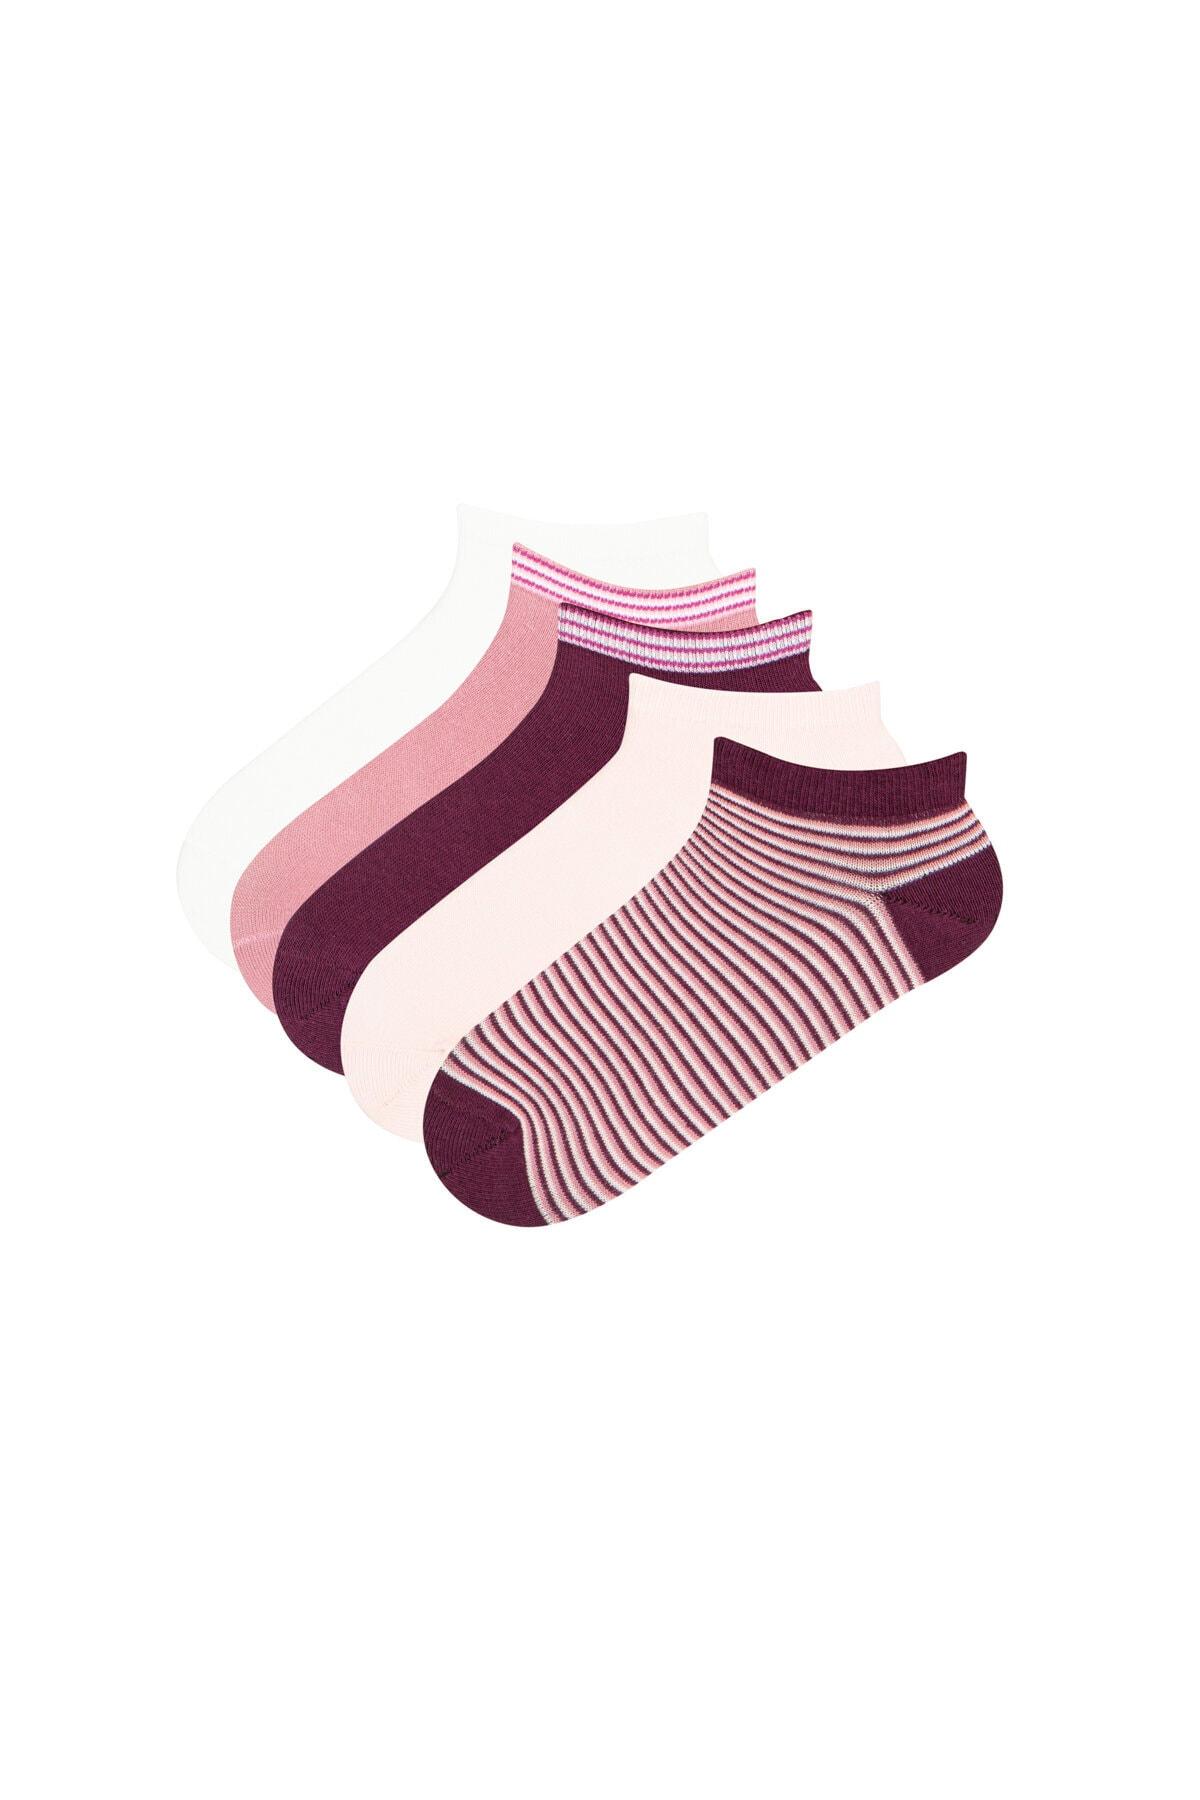 Penti Kadın Pembe - Çok Renkli Çember 5Li Patik Çorap 0